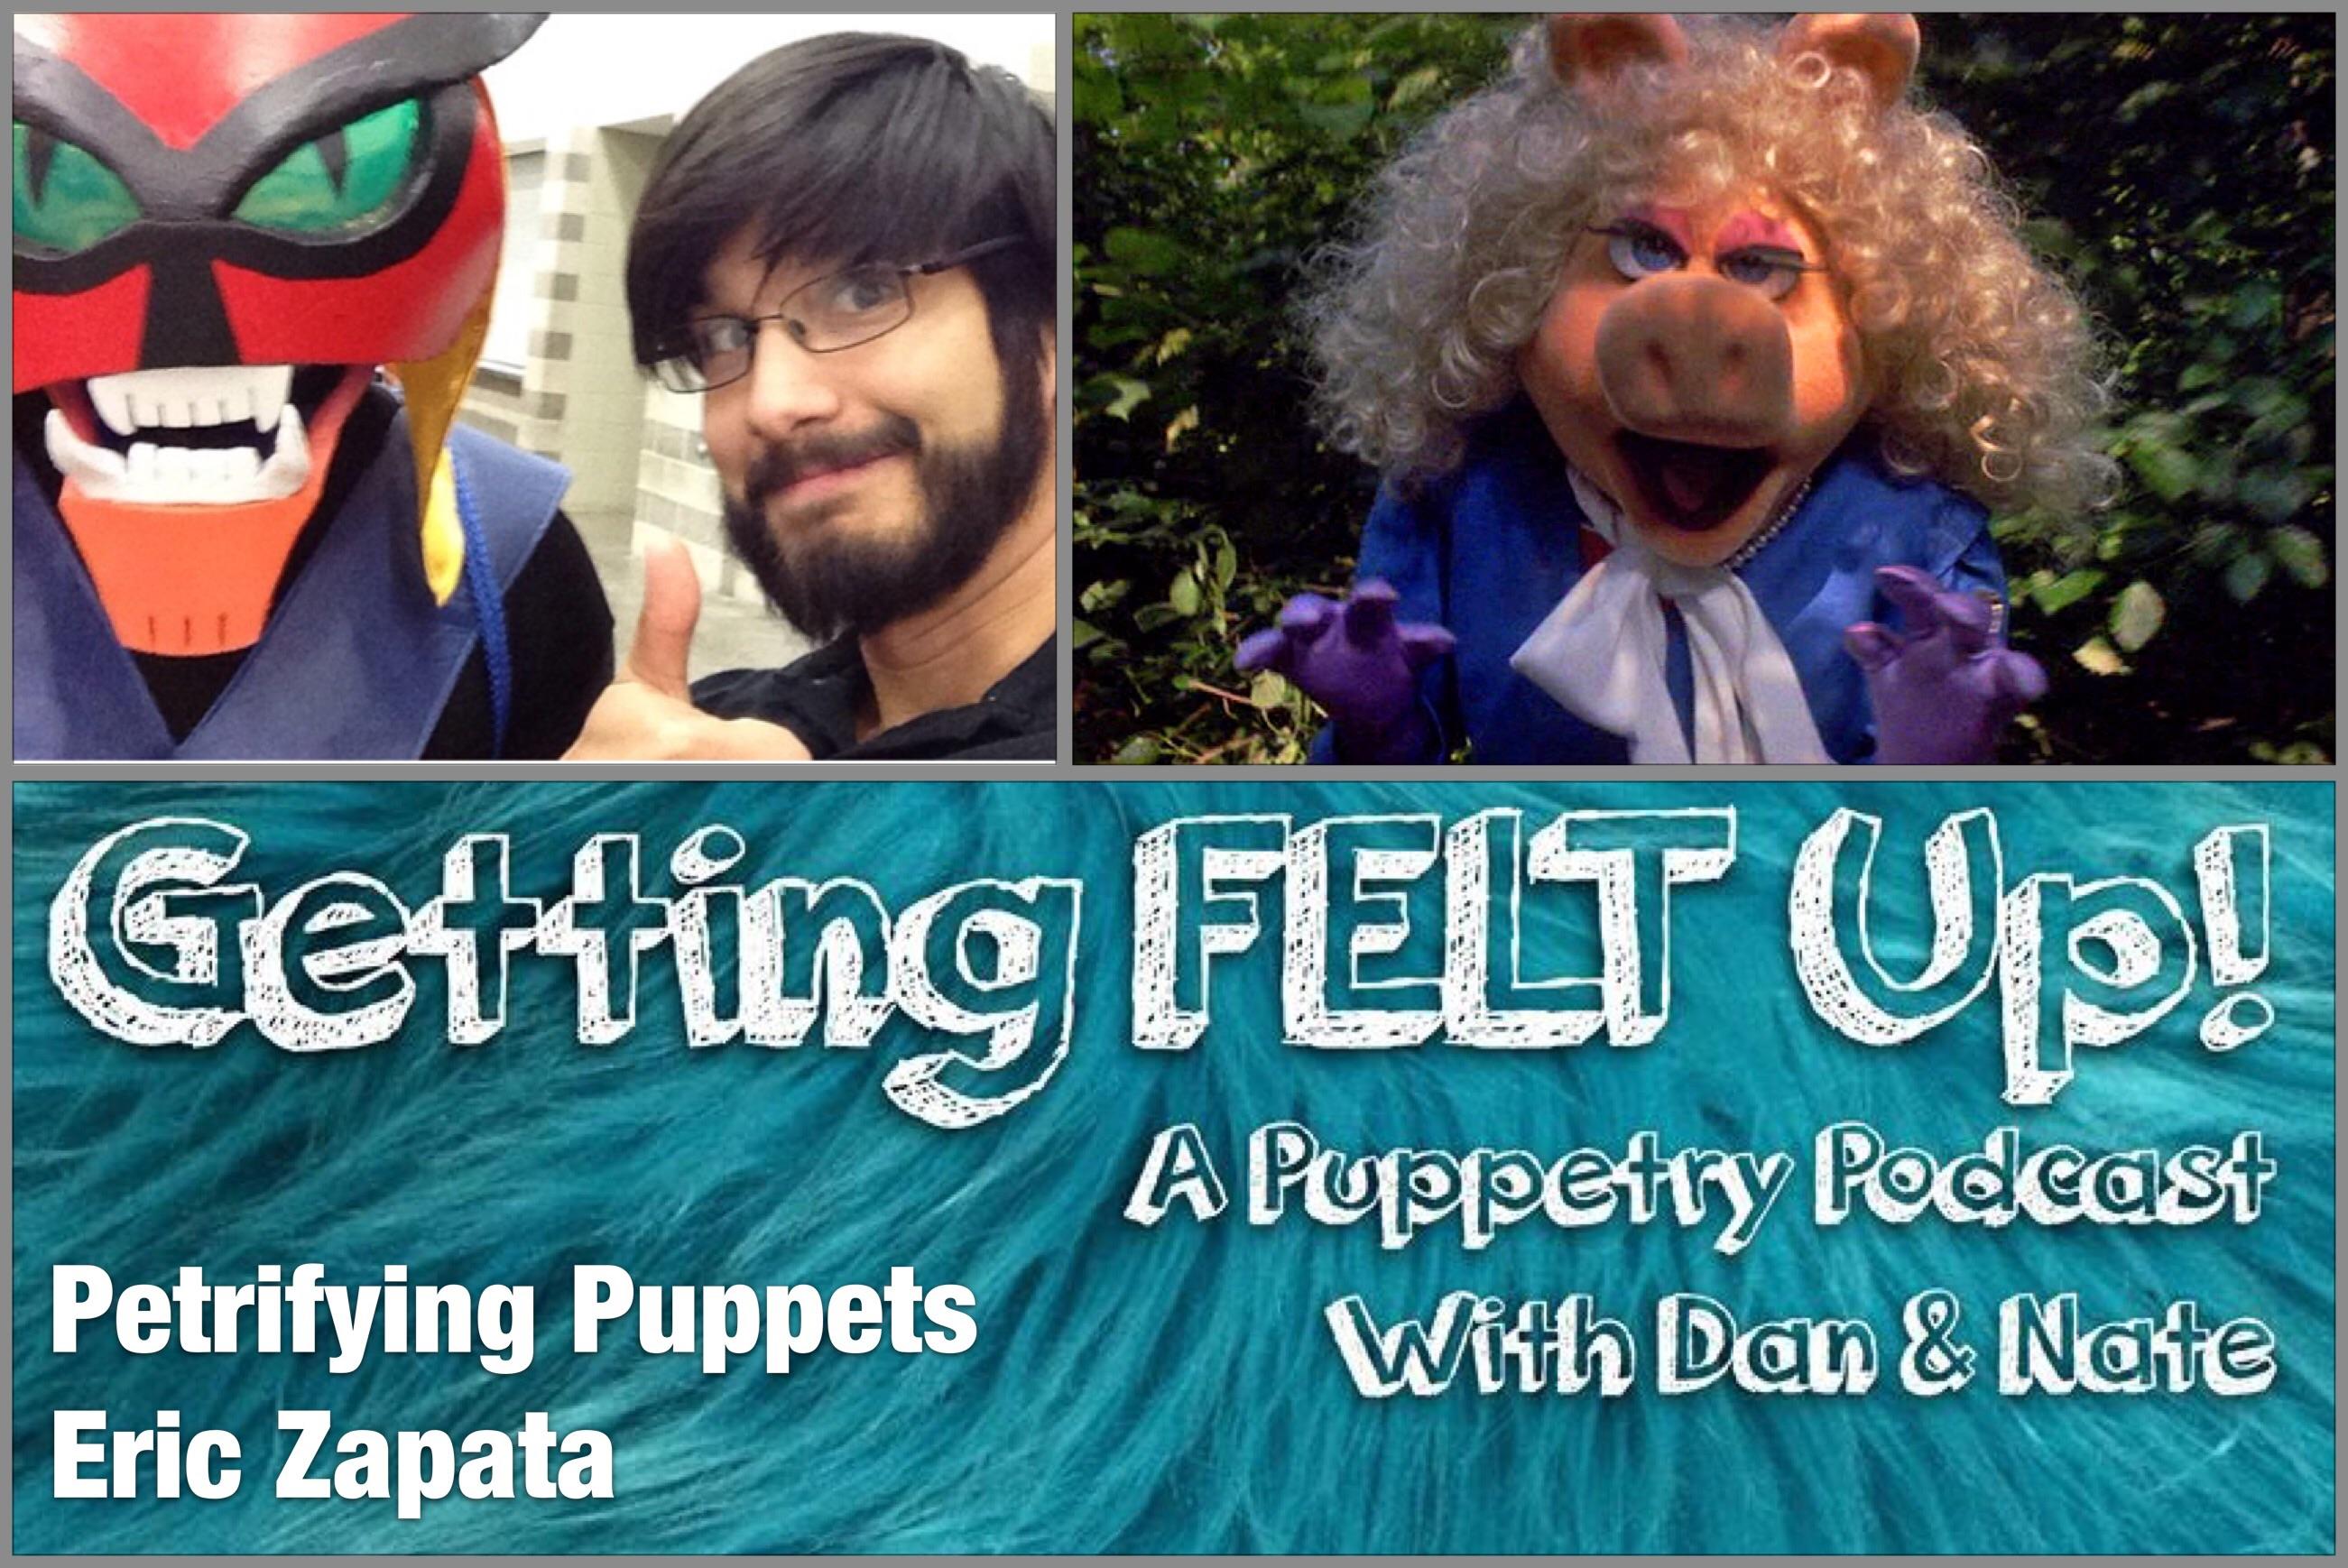 Eric Zapata's Petrifying Puppets